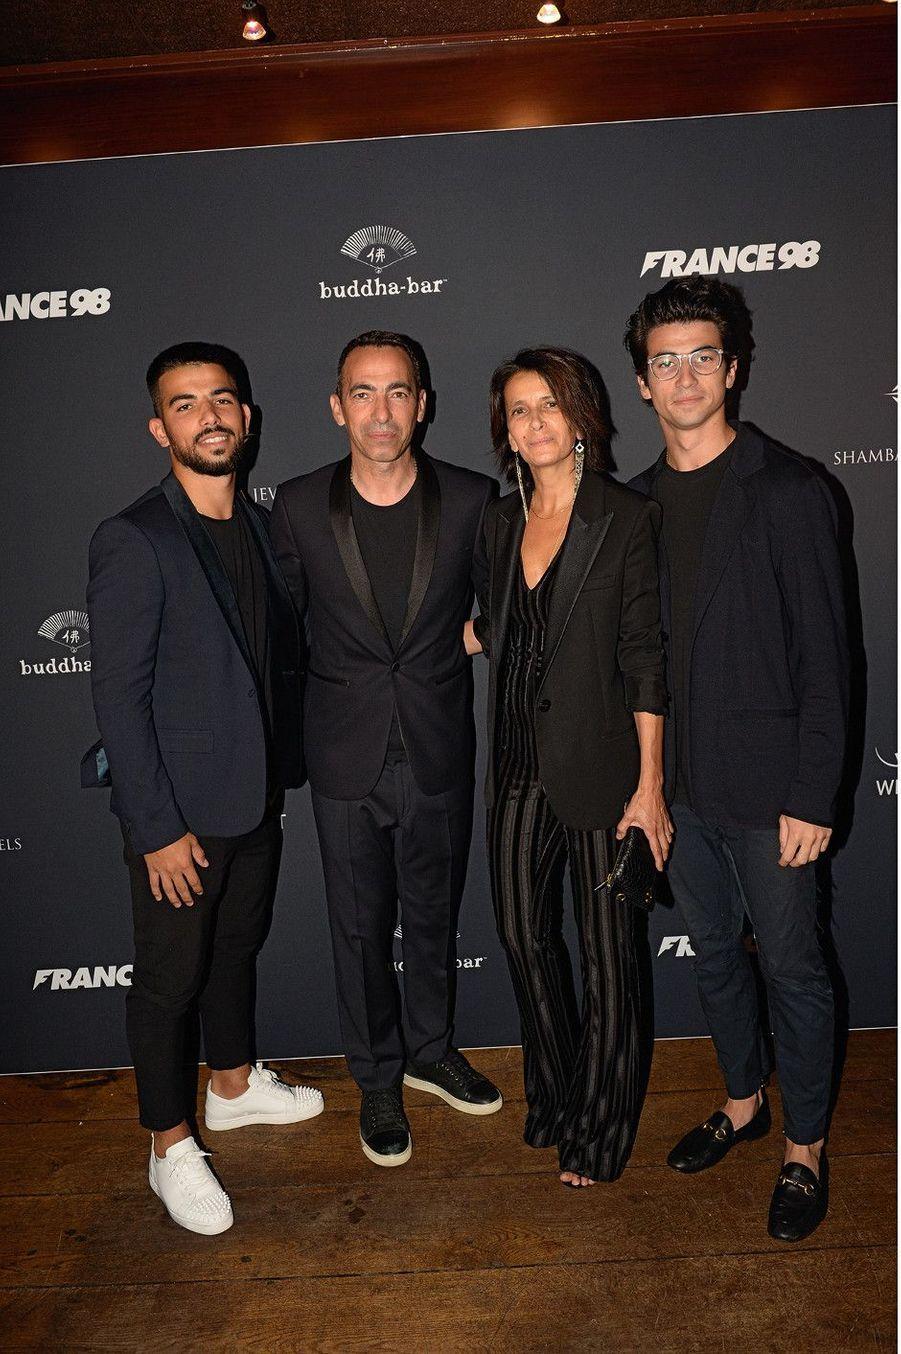 La famille Djorkaeff : Youri, sa femme, Sophie, leurs fils, Oan et Sacha.